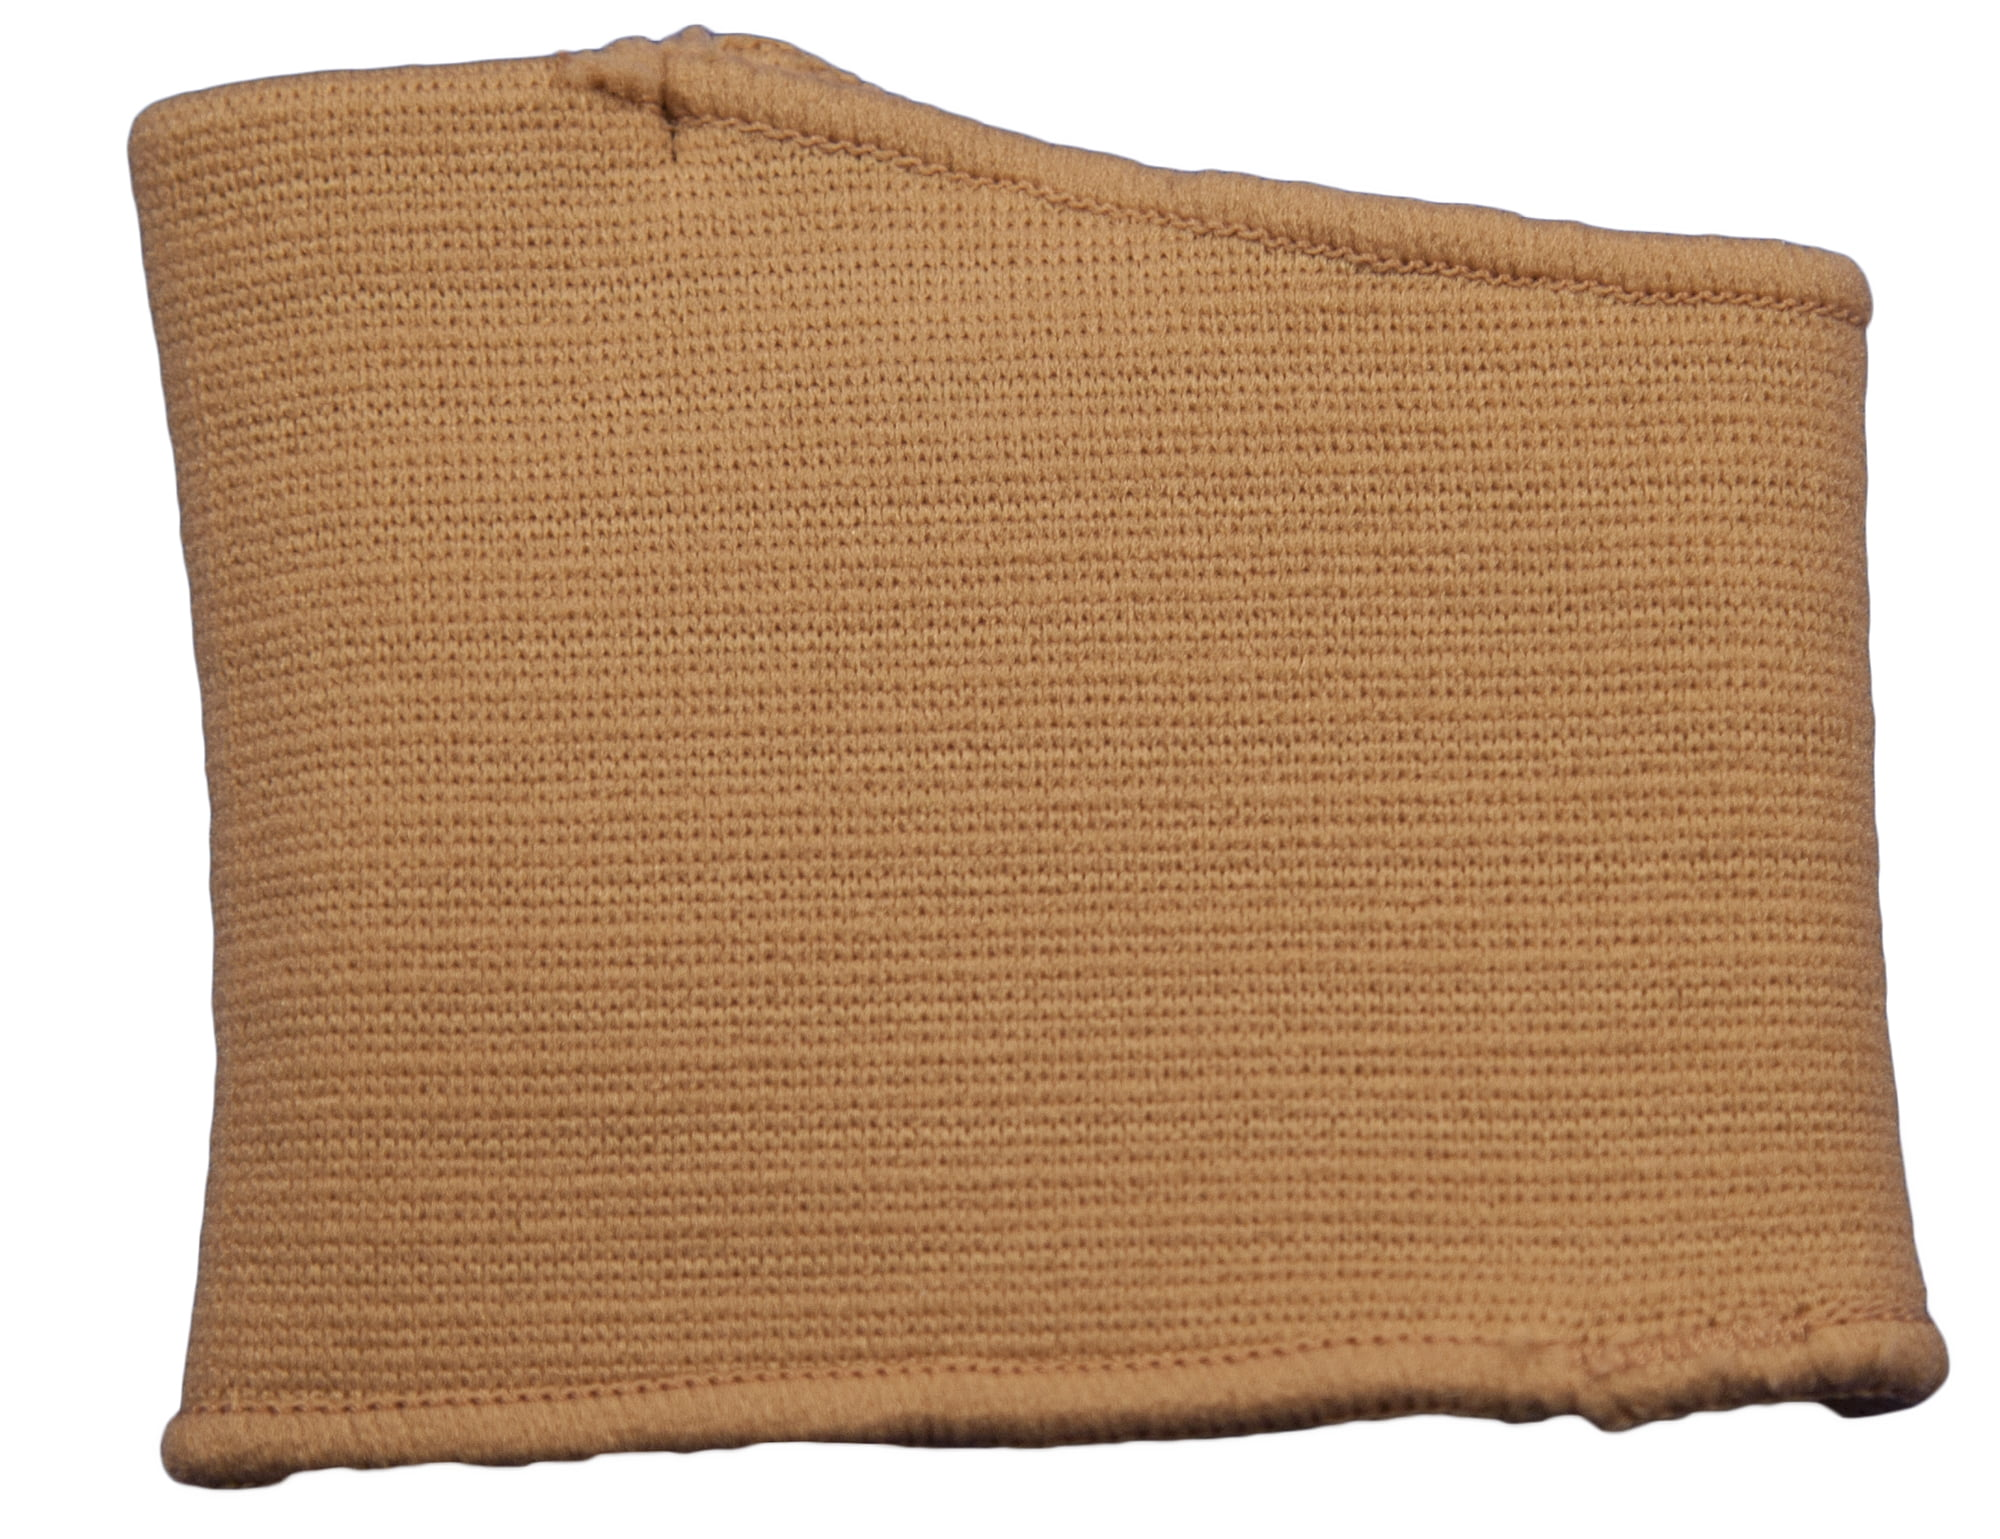 Bunga Ultra Metatarsal Cushion [UMC]